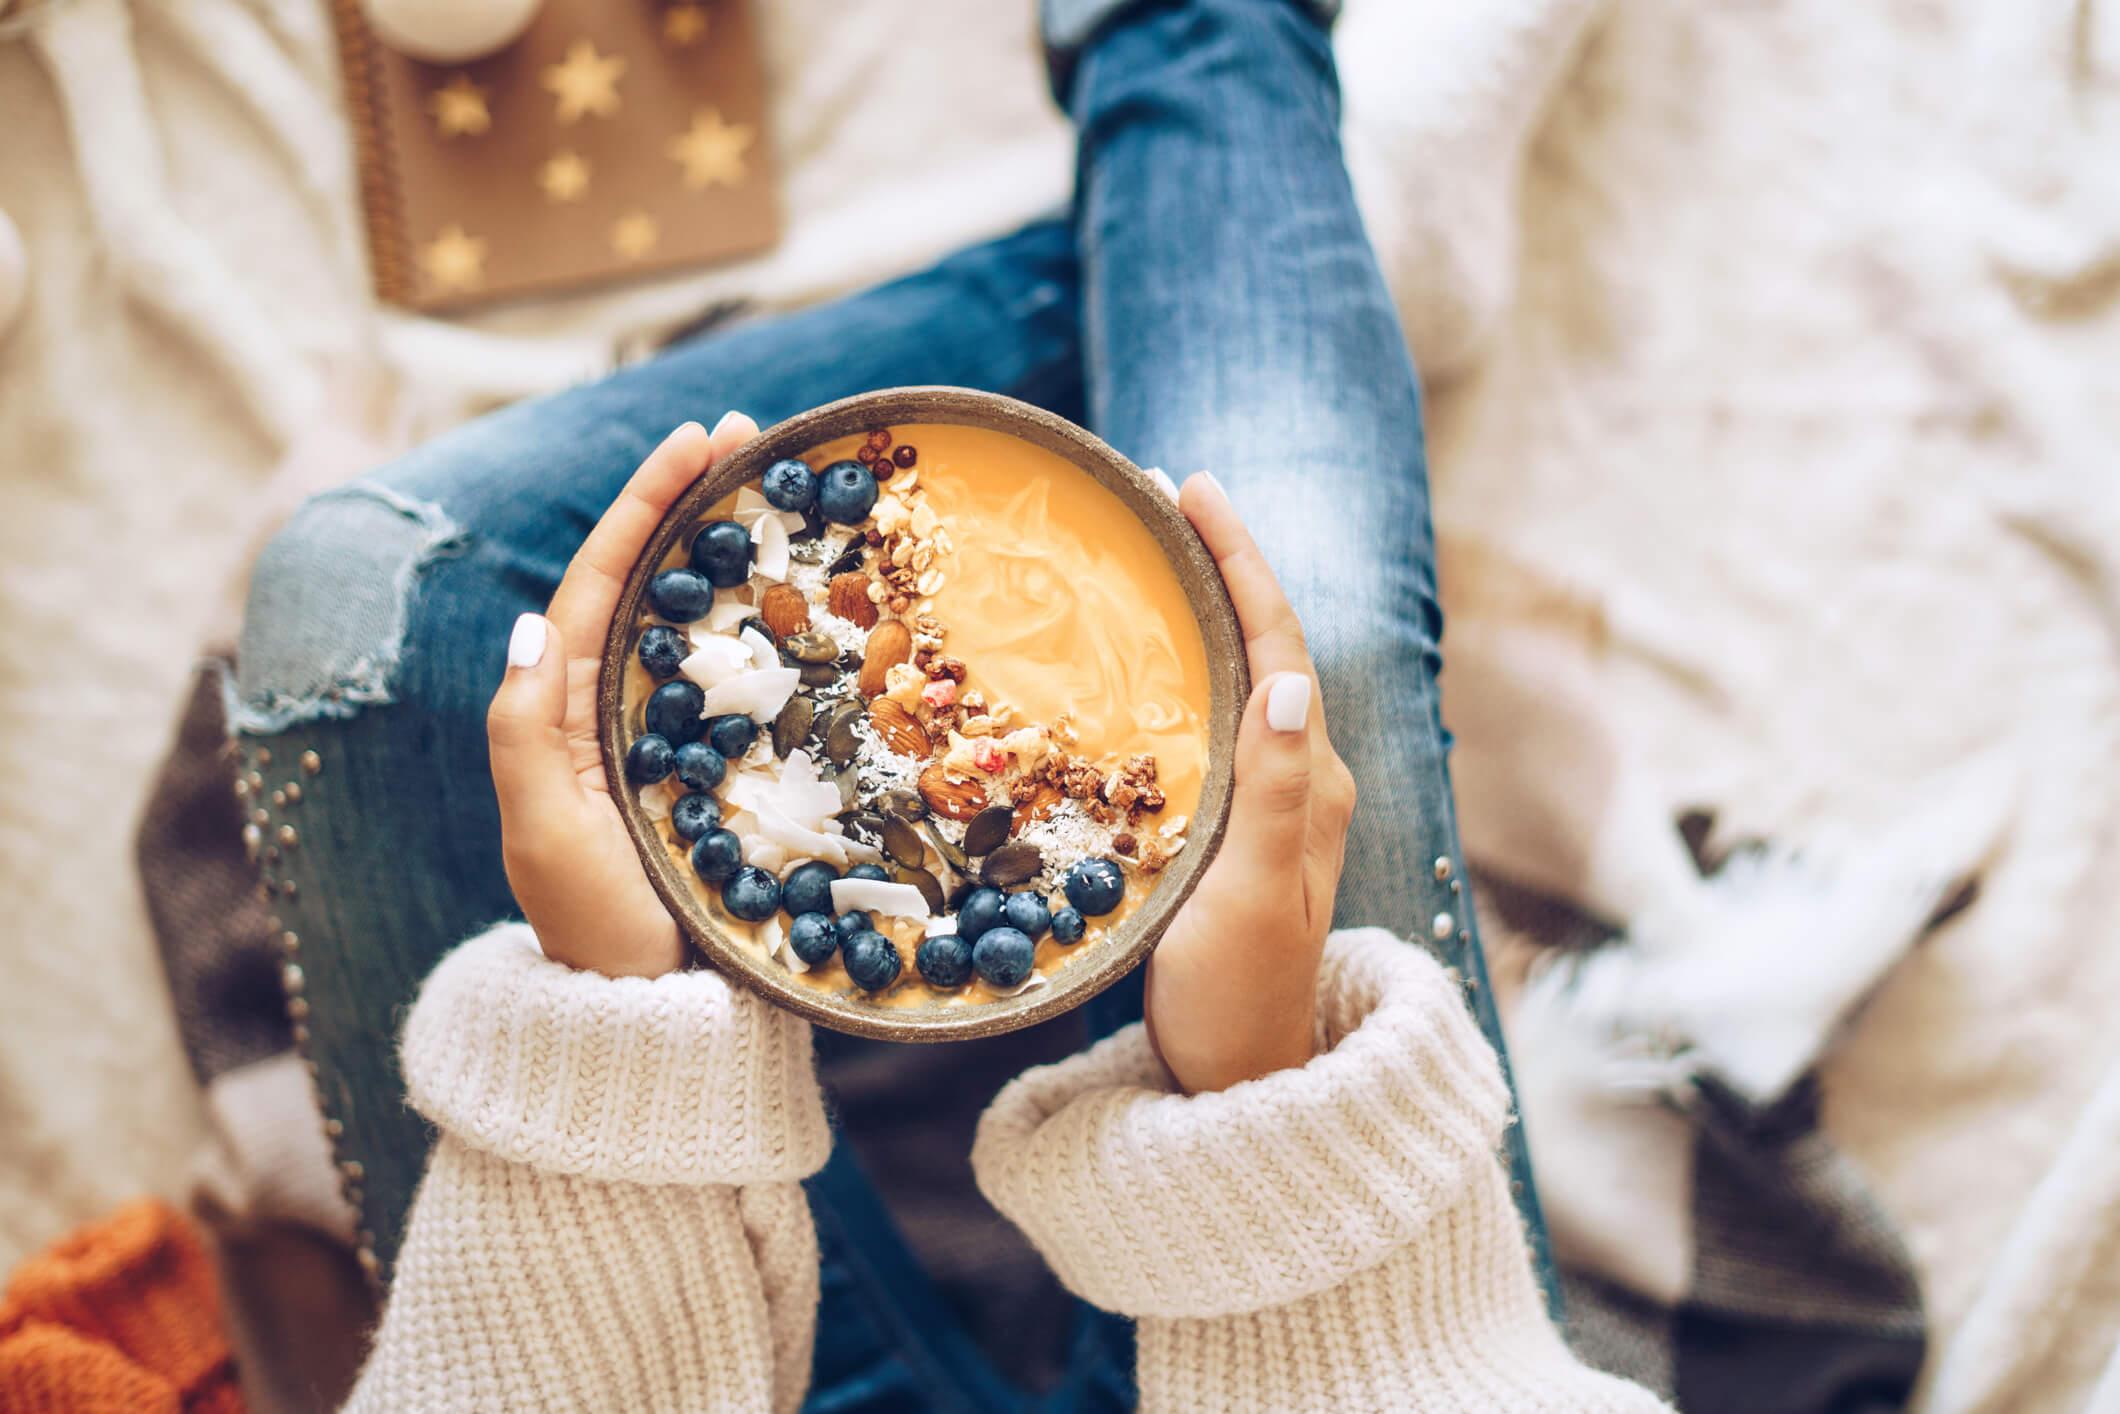 Manger sainement en hiver